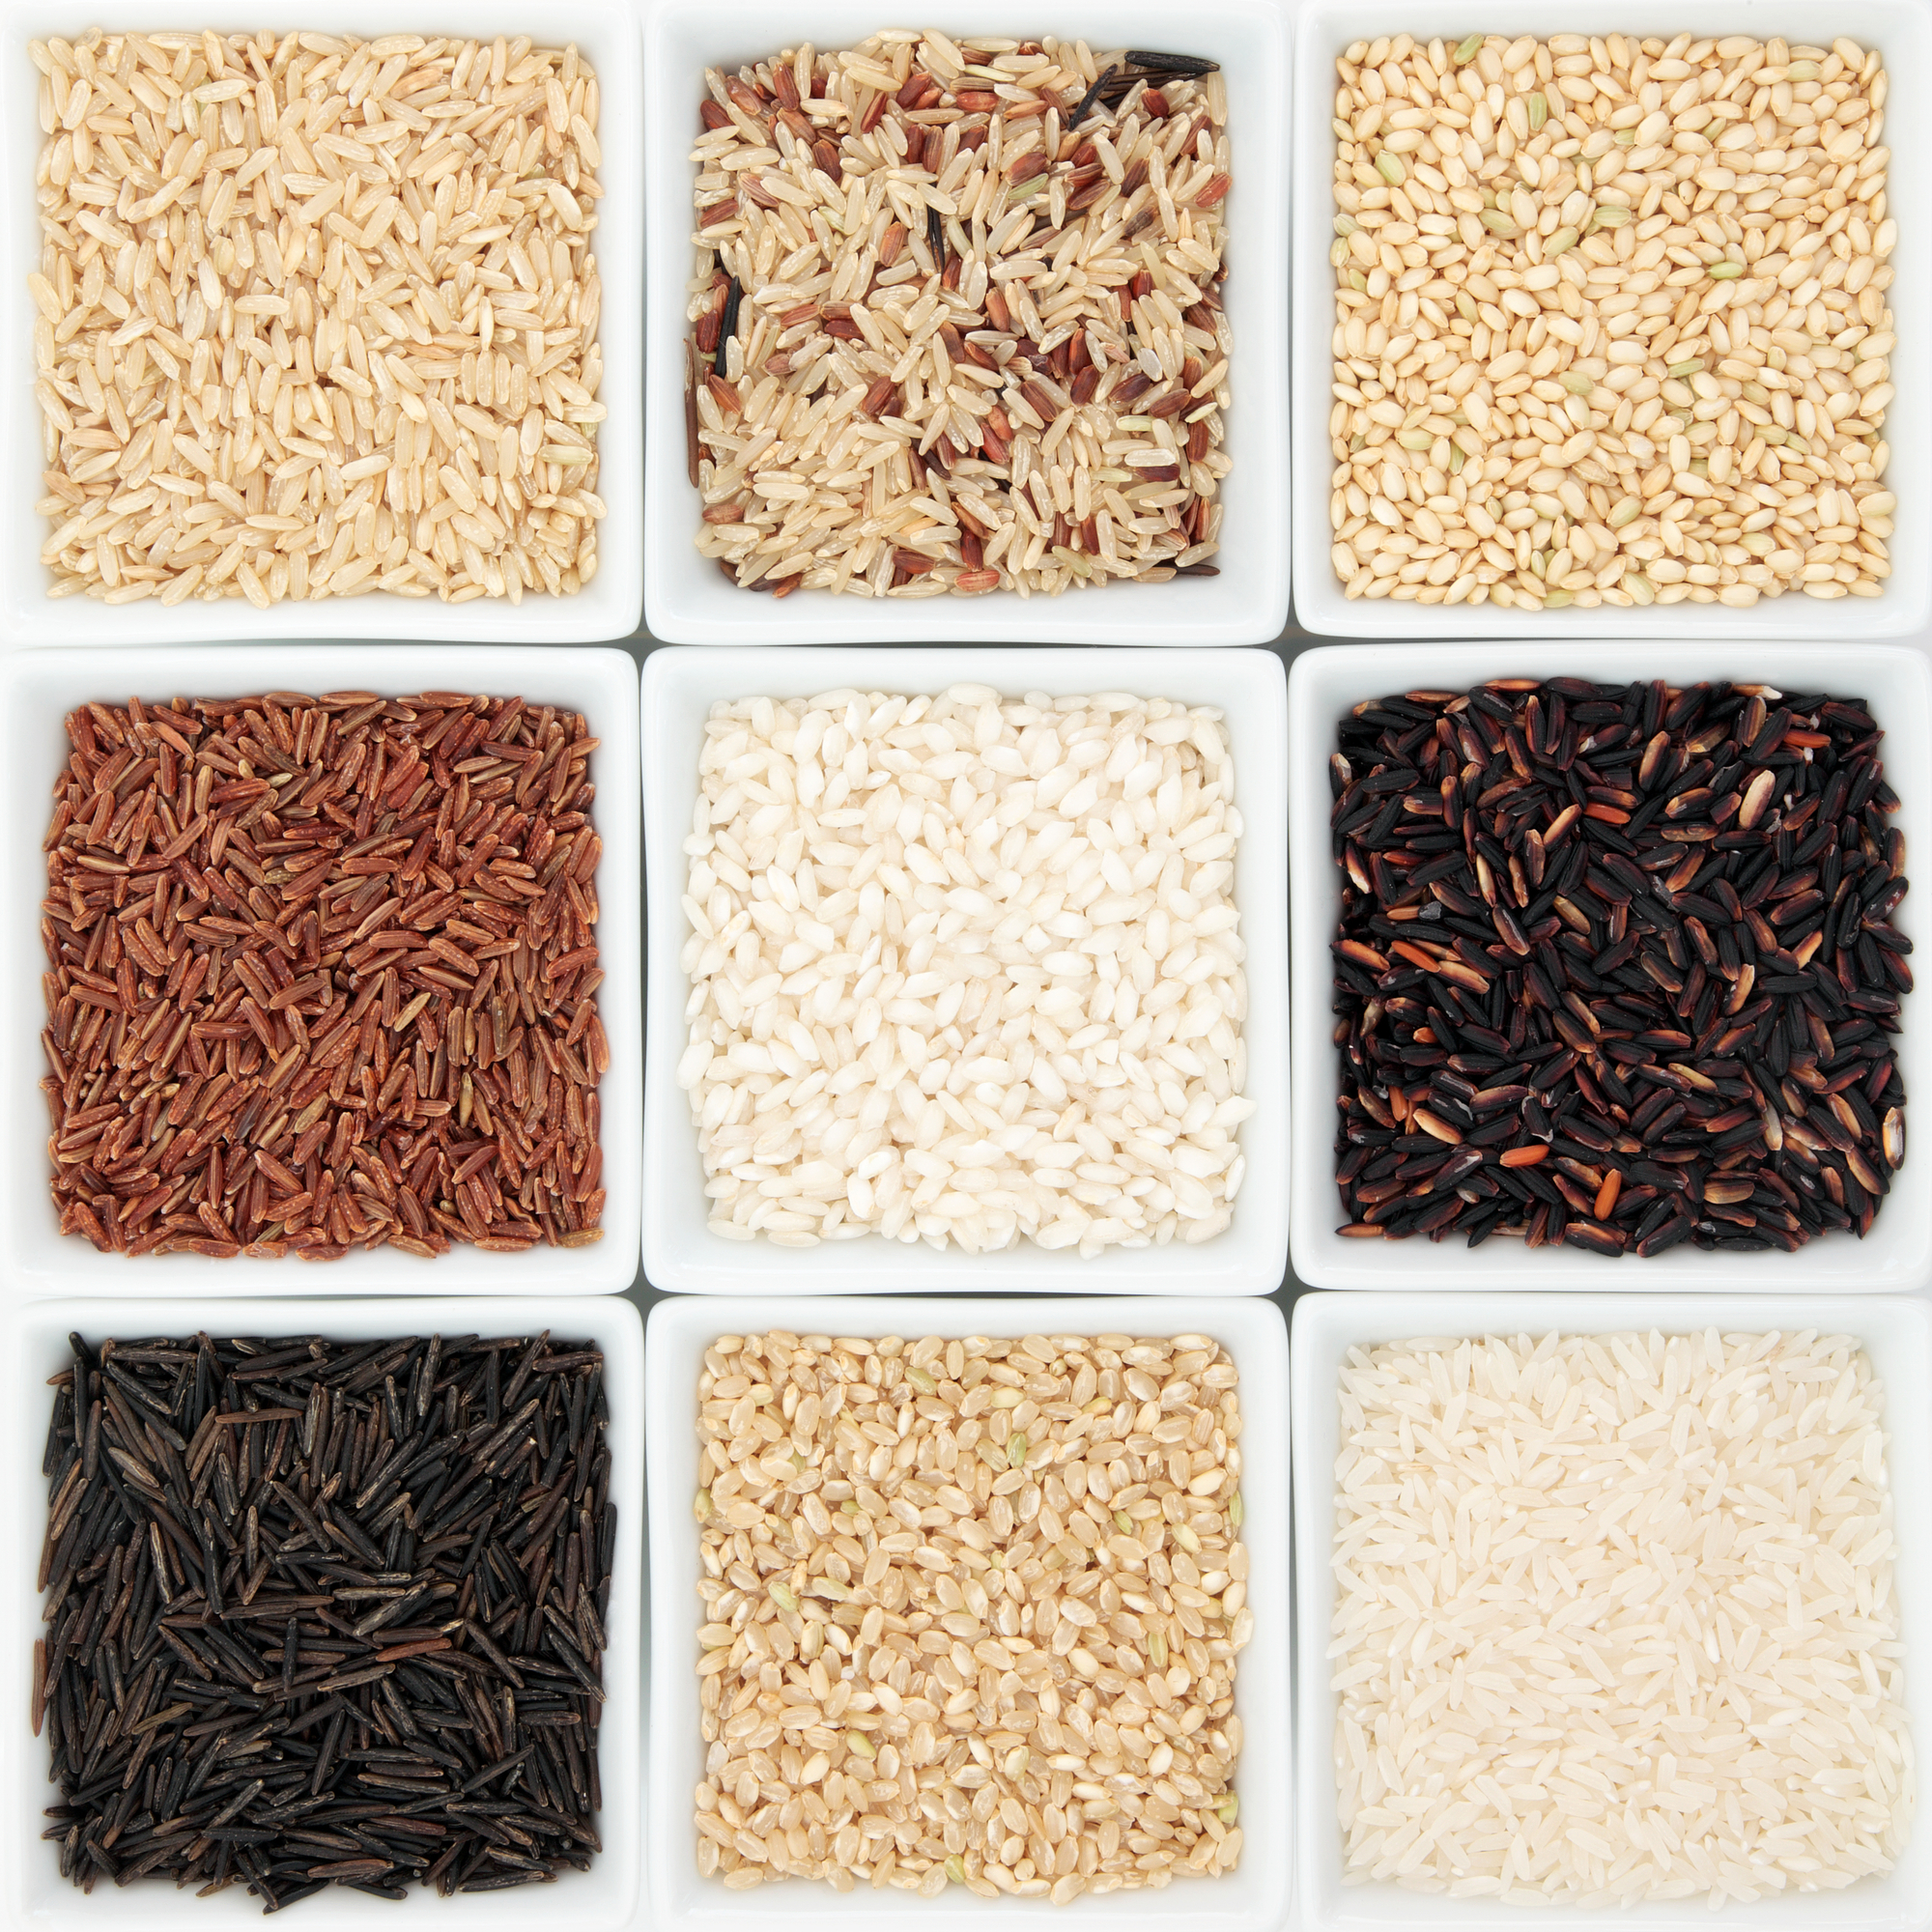 Rice Varieties -